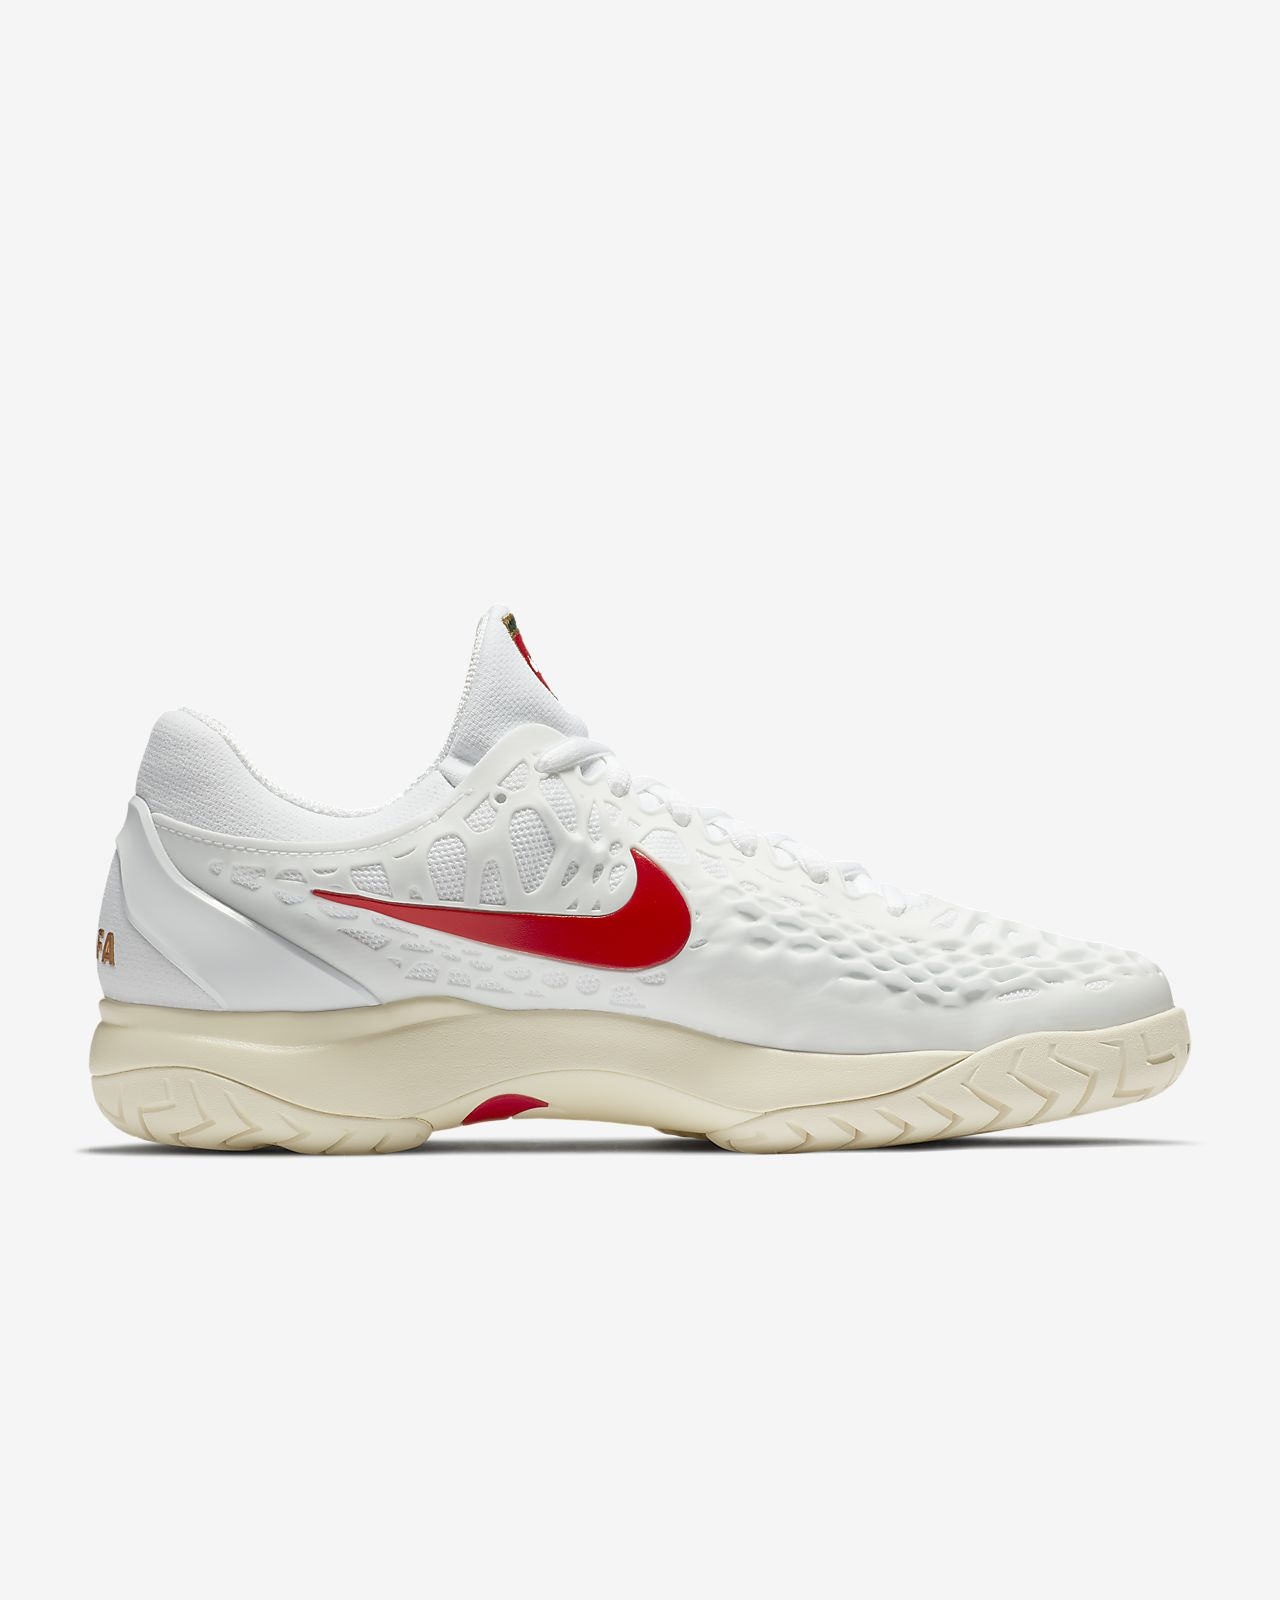 brand new 195a3 1048b scarpa da tennis nike zoom cage 3 hc bianco light cream metallic  gold university red 918193-103